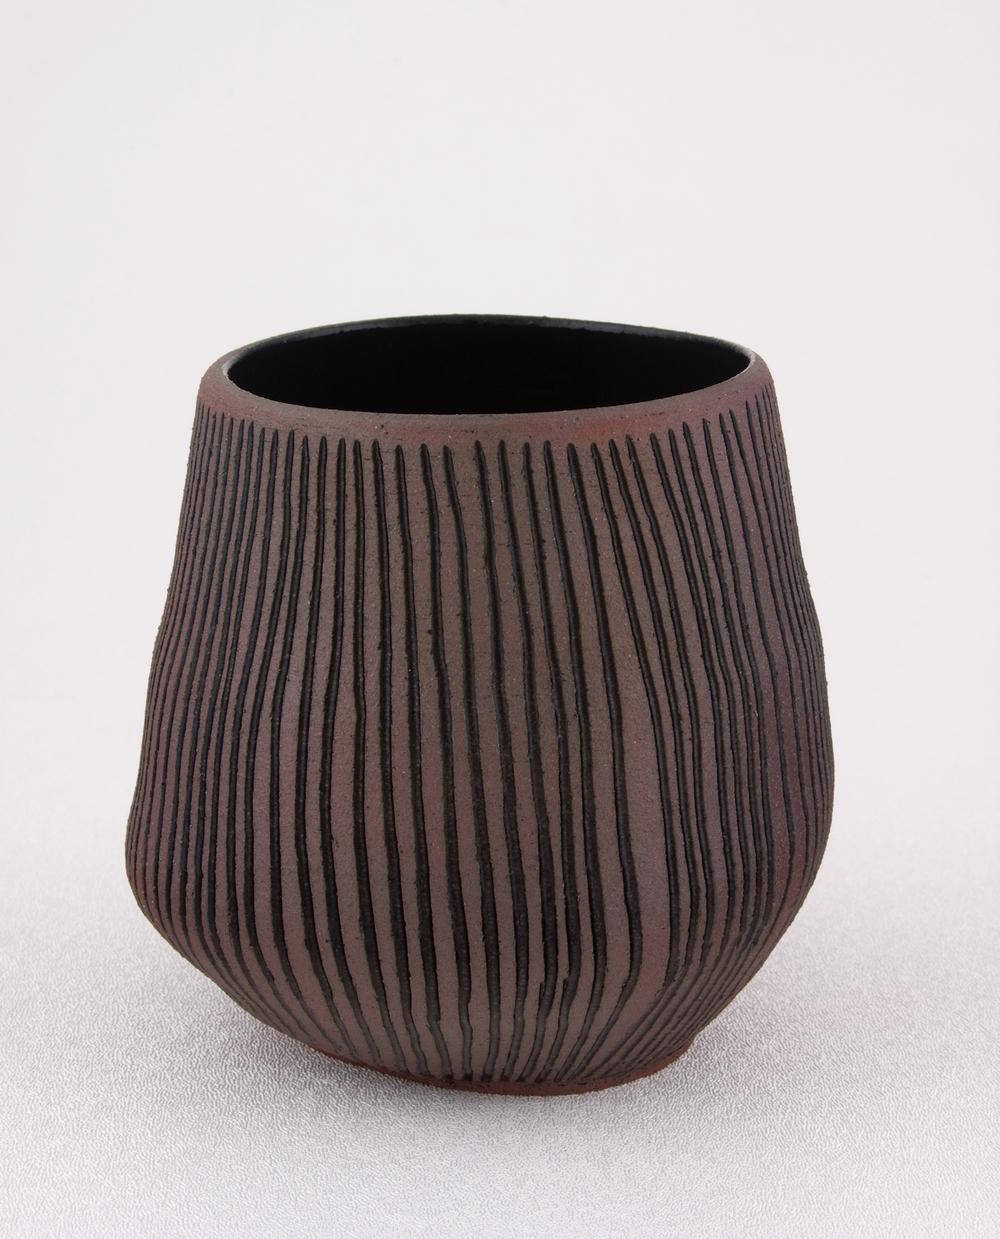 Shio Kusaka  Untitled (carved stripe 2)  2009 Stoneware 4 1/2h x 4w x 4d in SK022